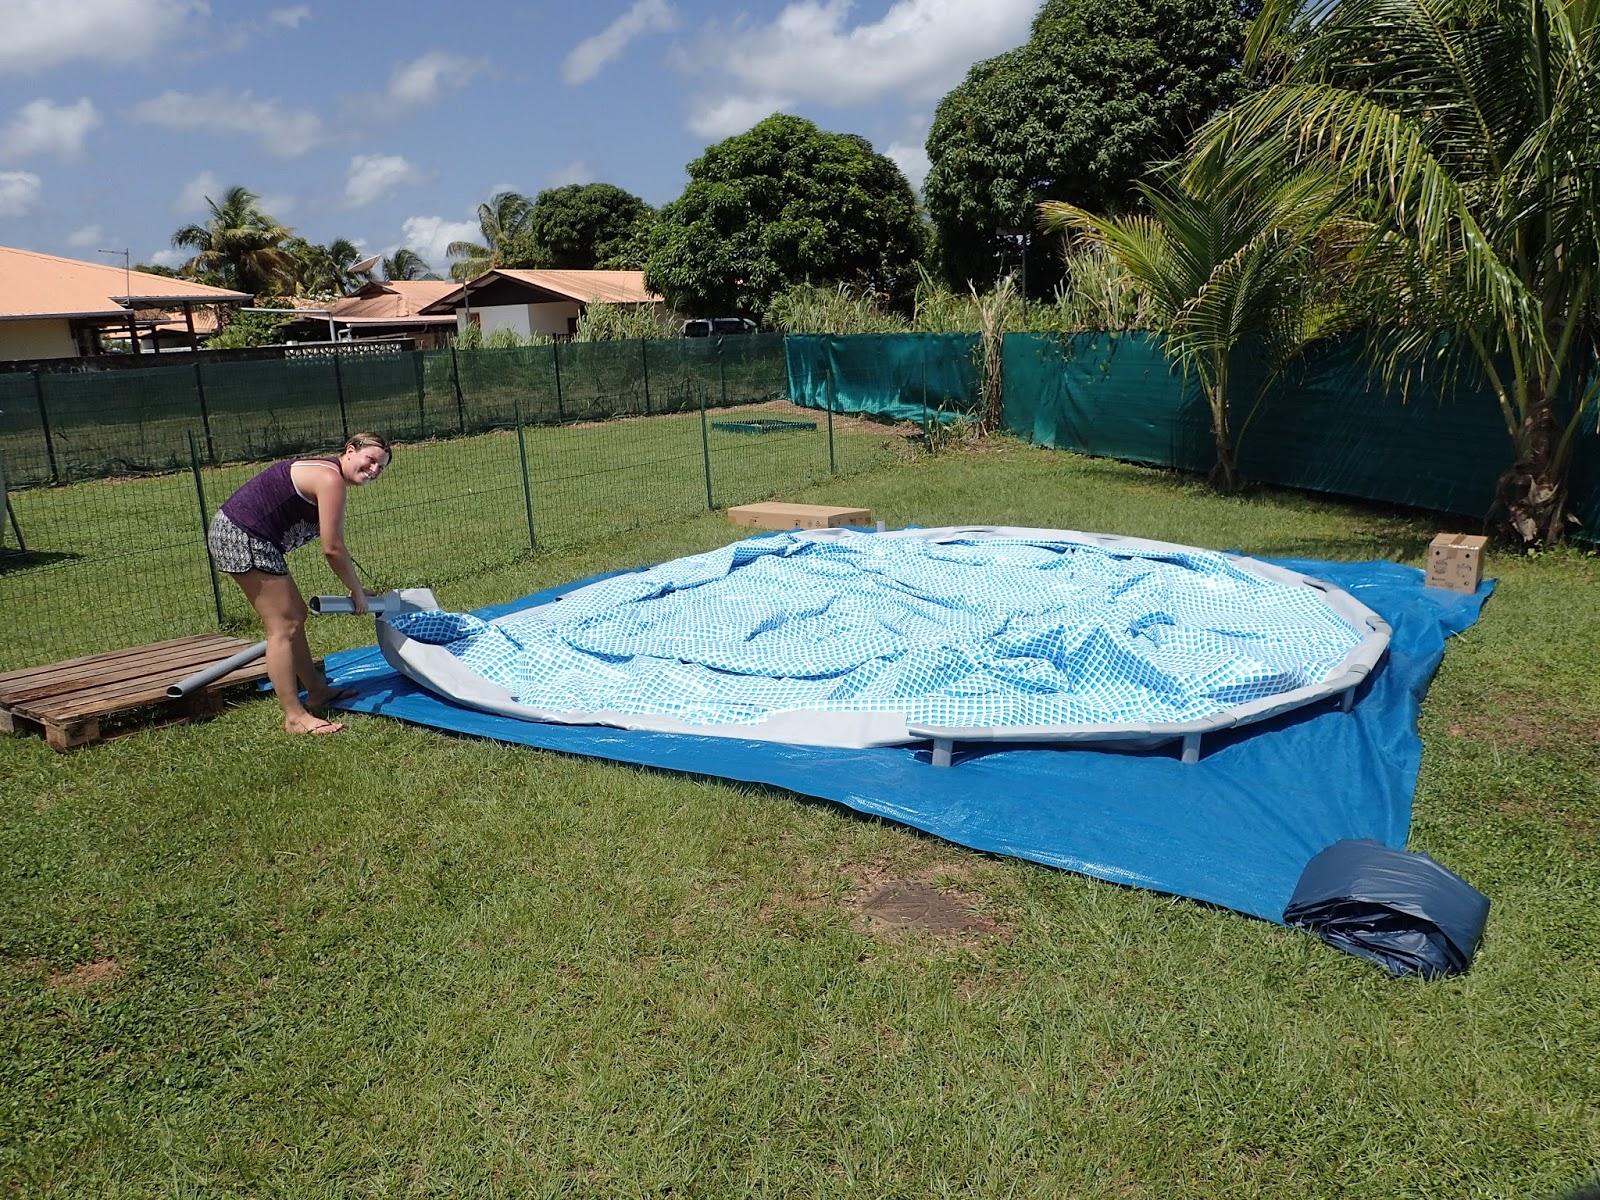 Bulles d 39 arual la piscine for Piscine chlore trop bas